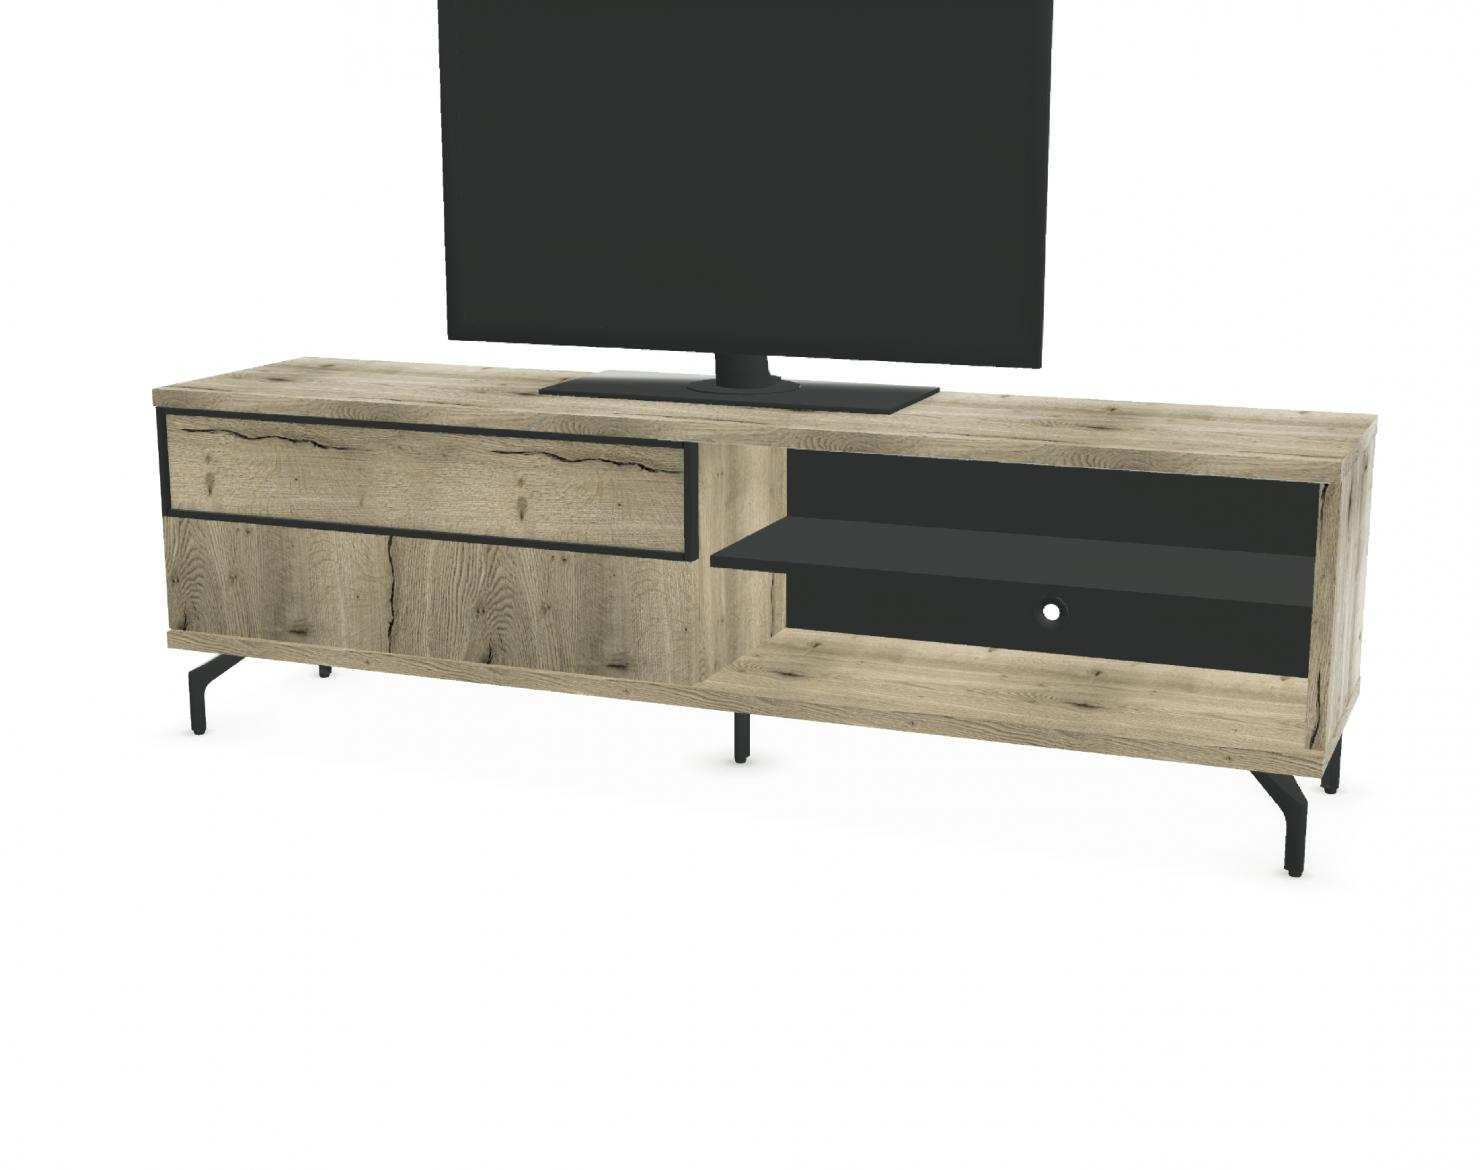 Meuble Tv Hifi Intégré meuble tv 1 porte coulissante + 2 niches façade bois